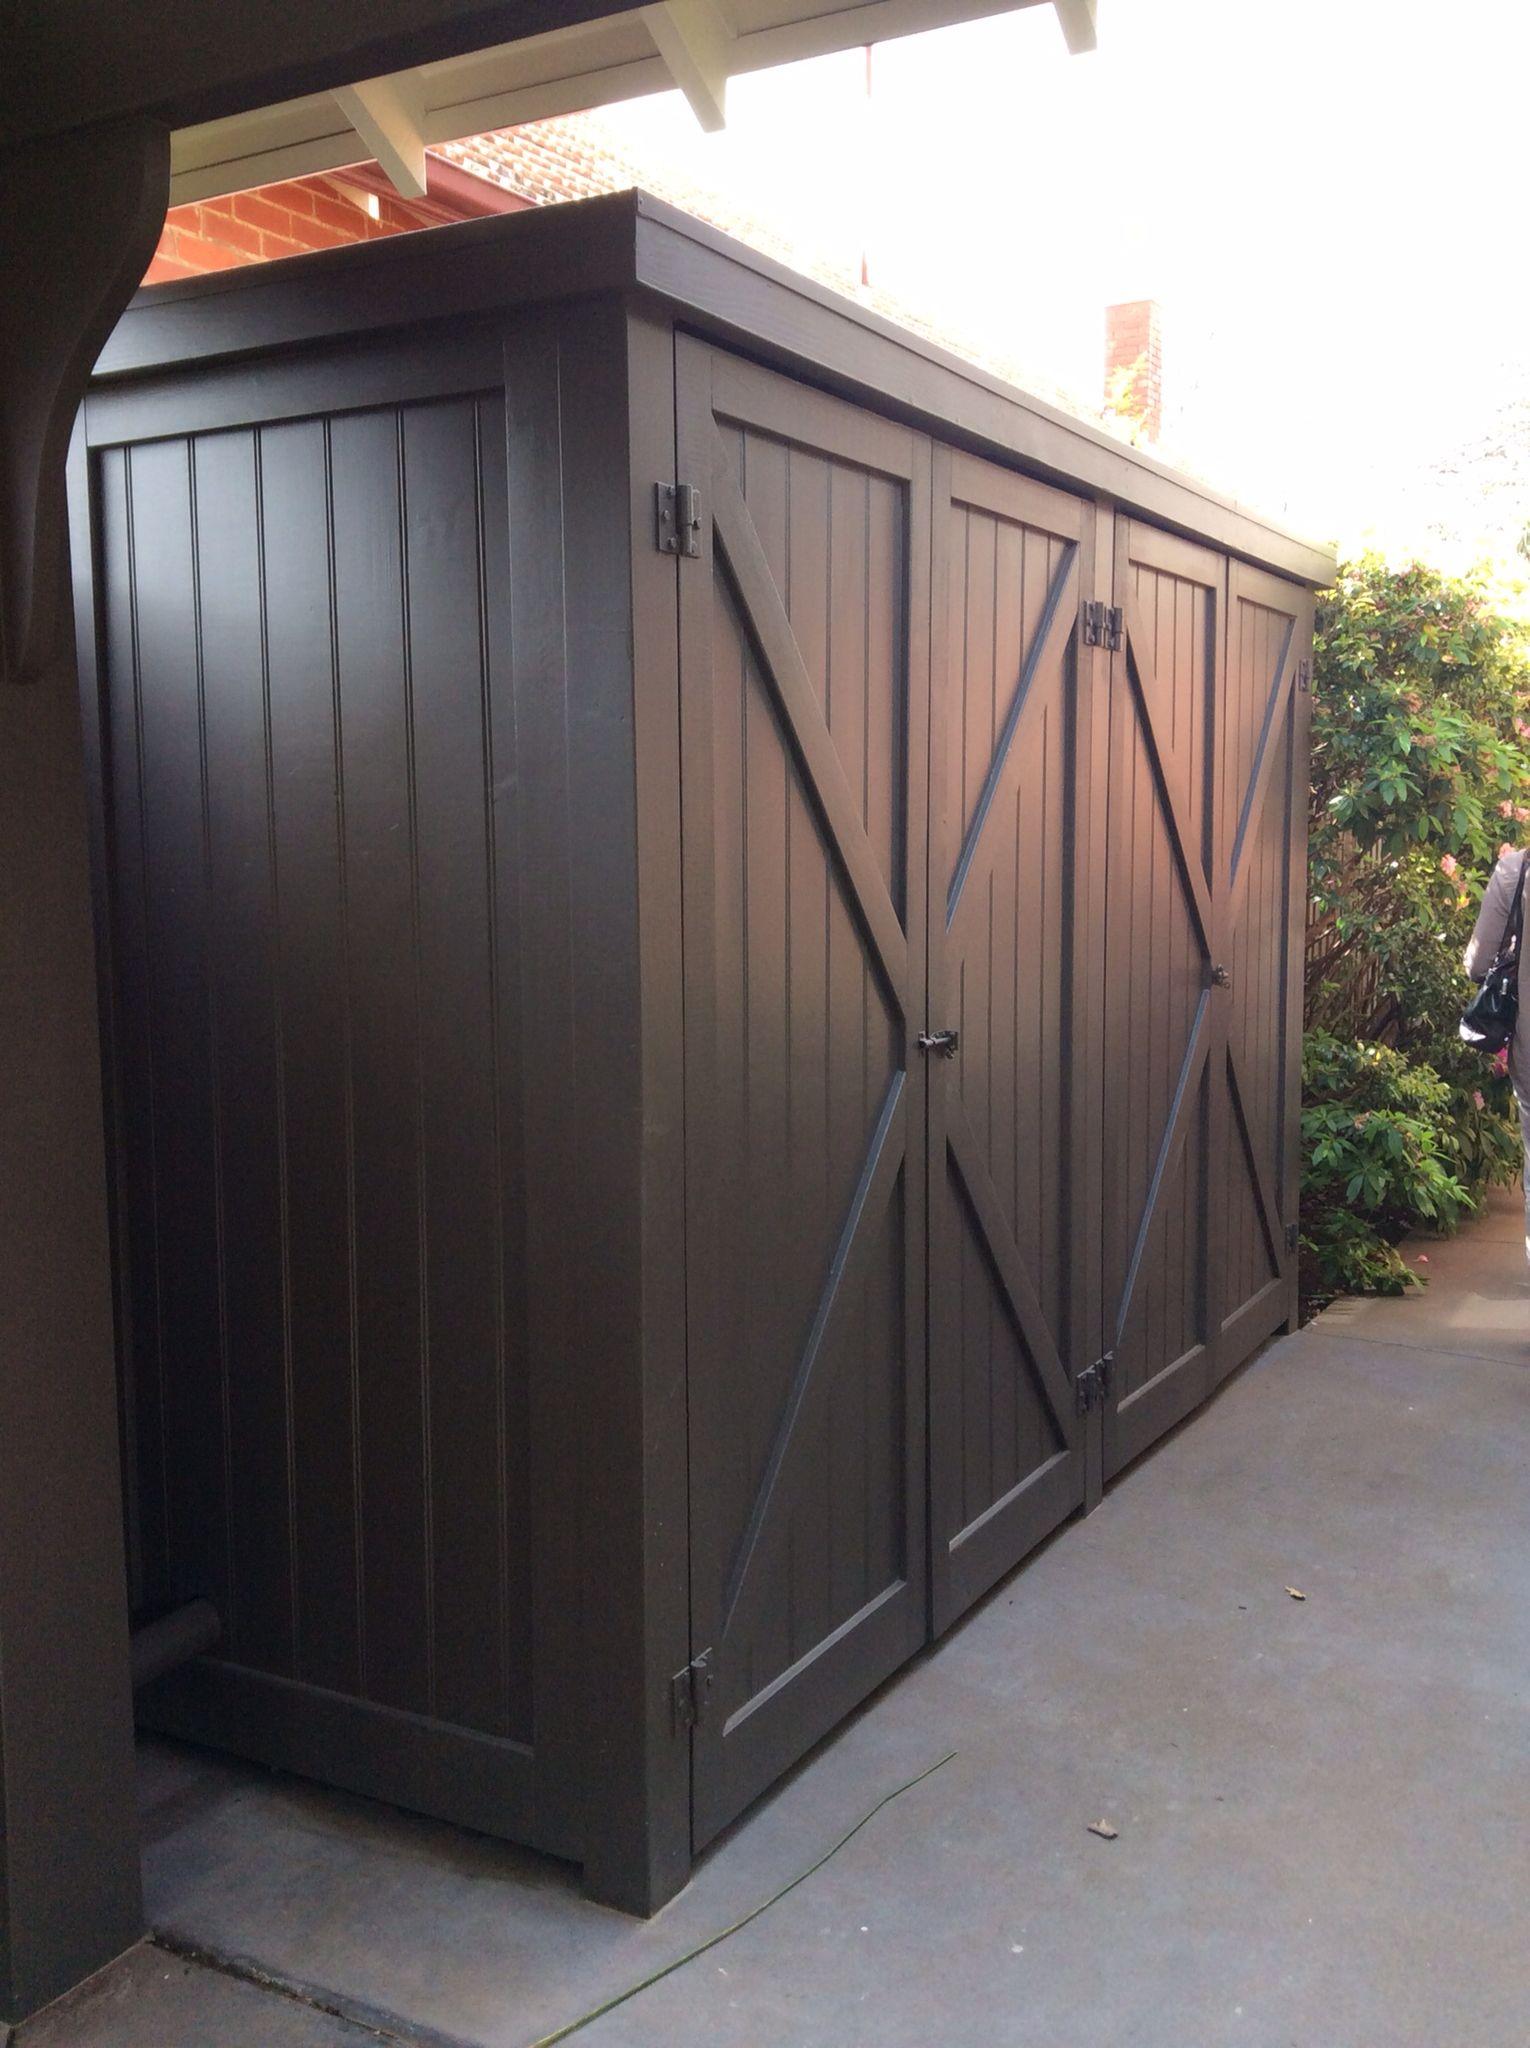 Garden shed storage  작업실 외관  Pinterest  야외 생활, 창고 및 정원